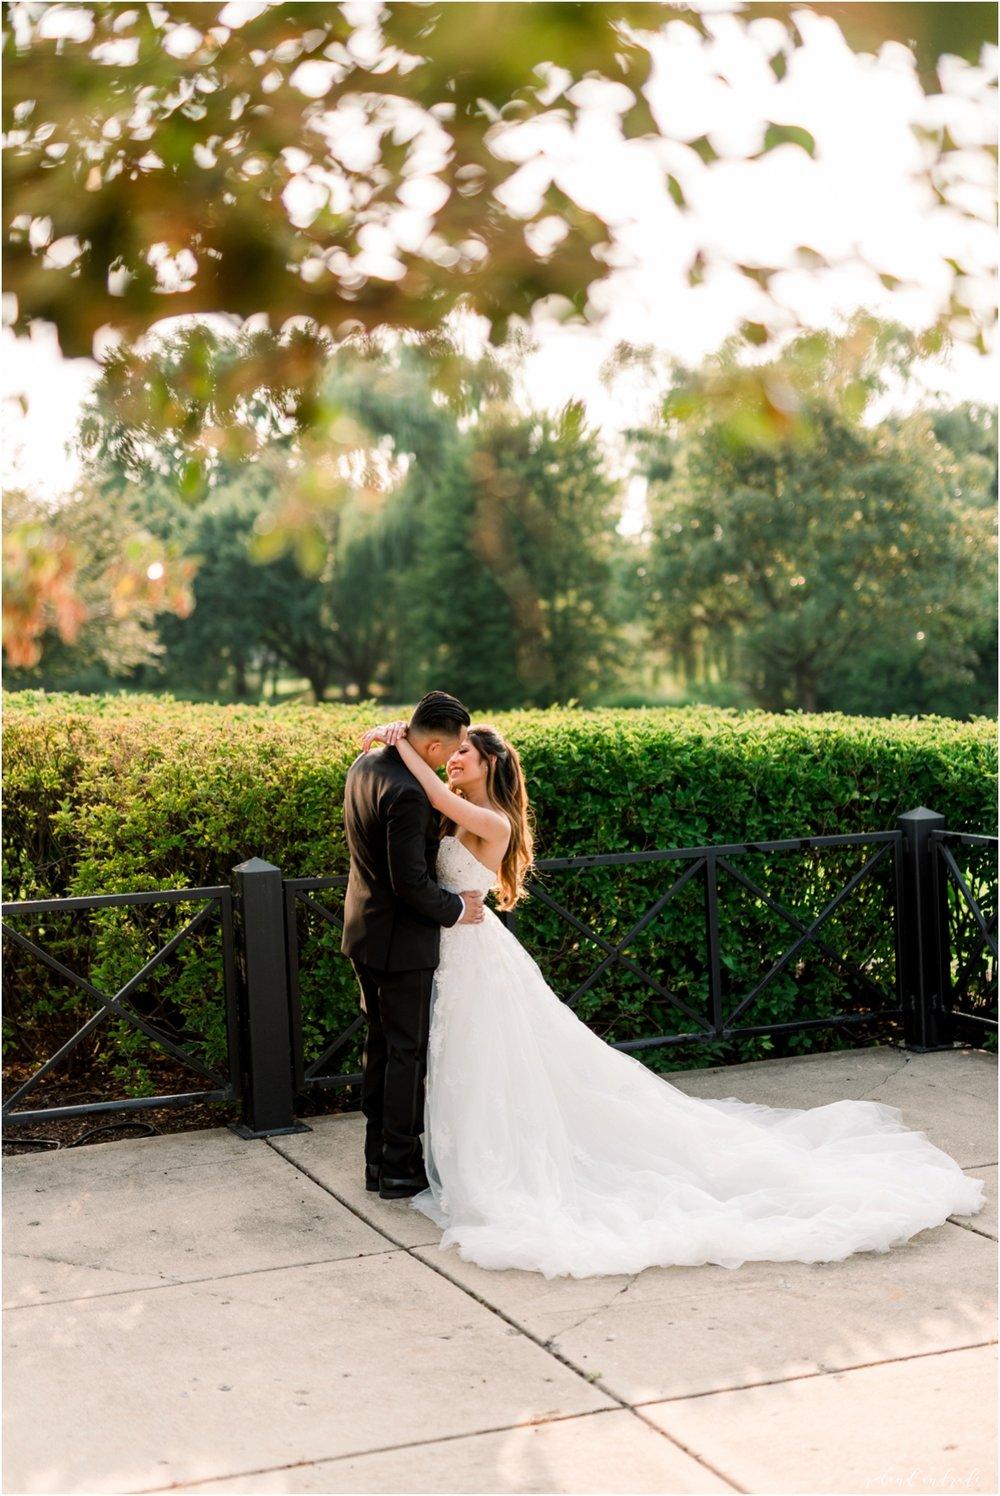 Meridian Banquets Wedding, Rolling Meadows Illinois Wedding, Chicago Wedding Photographer, Aurora Wedding Photographer, Best Photographer In Aurora, Best Photographer In Chicago_0085.jpg